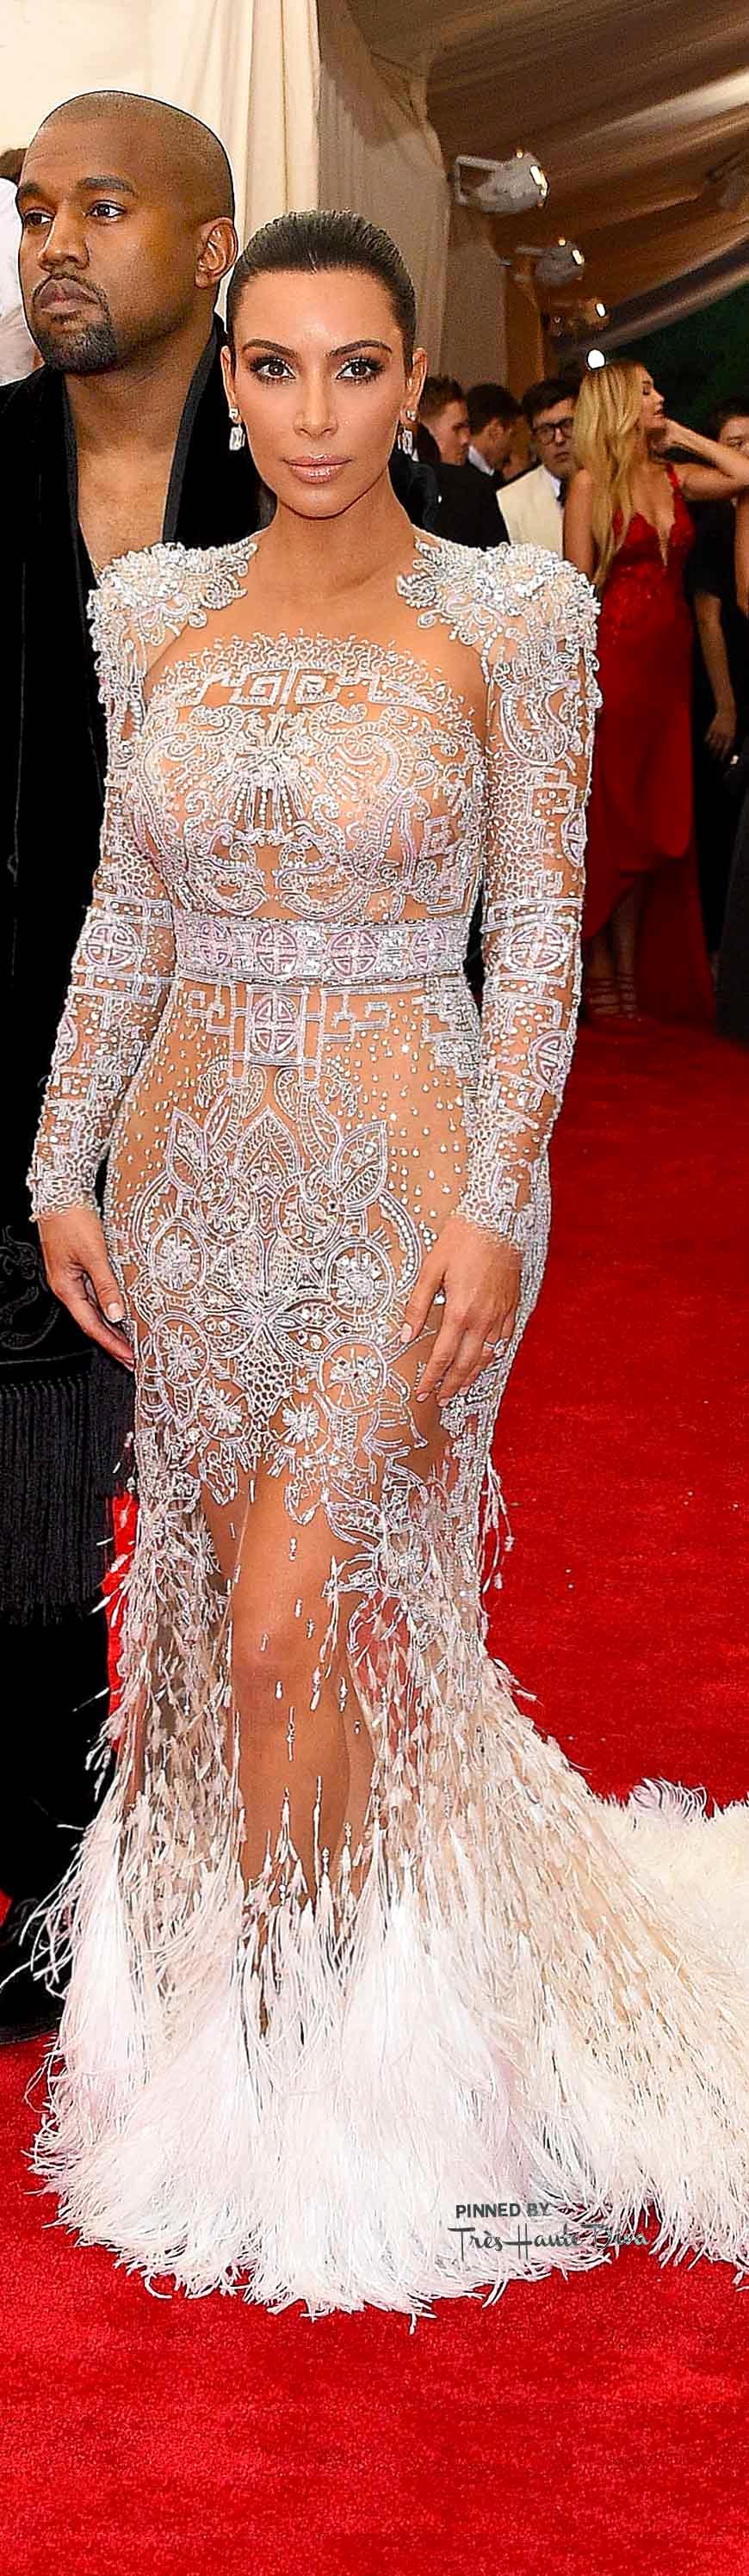 Kim Kardashian in Roberto Cavalli Getty Images/ Larry Busacca